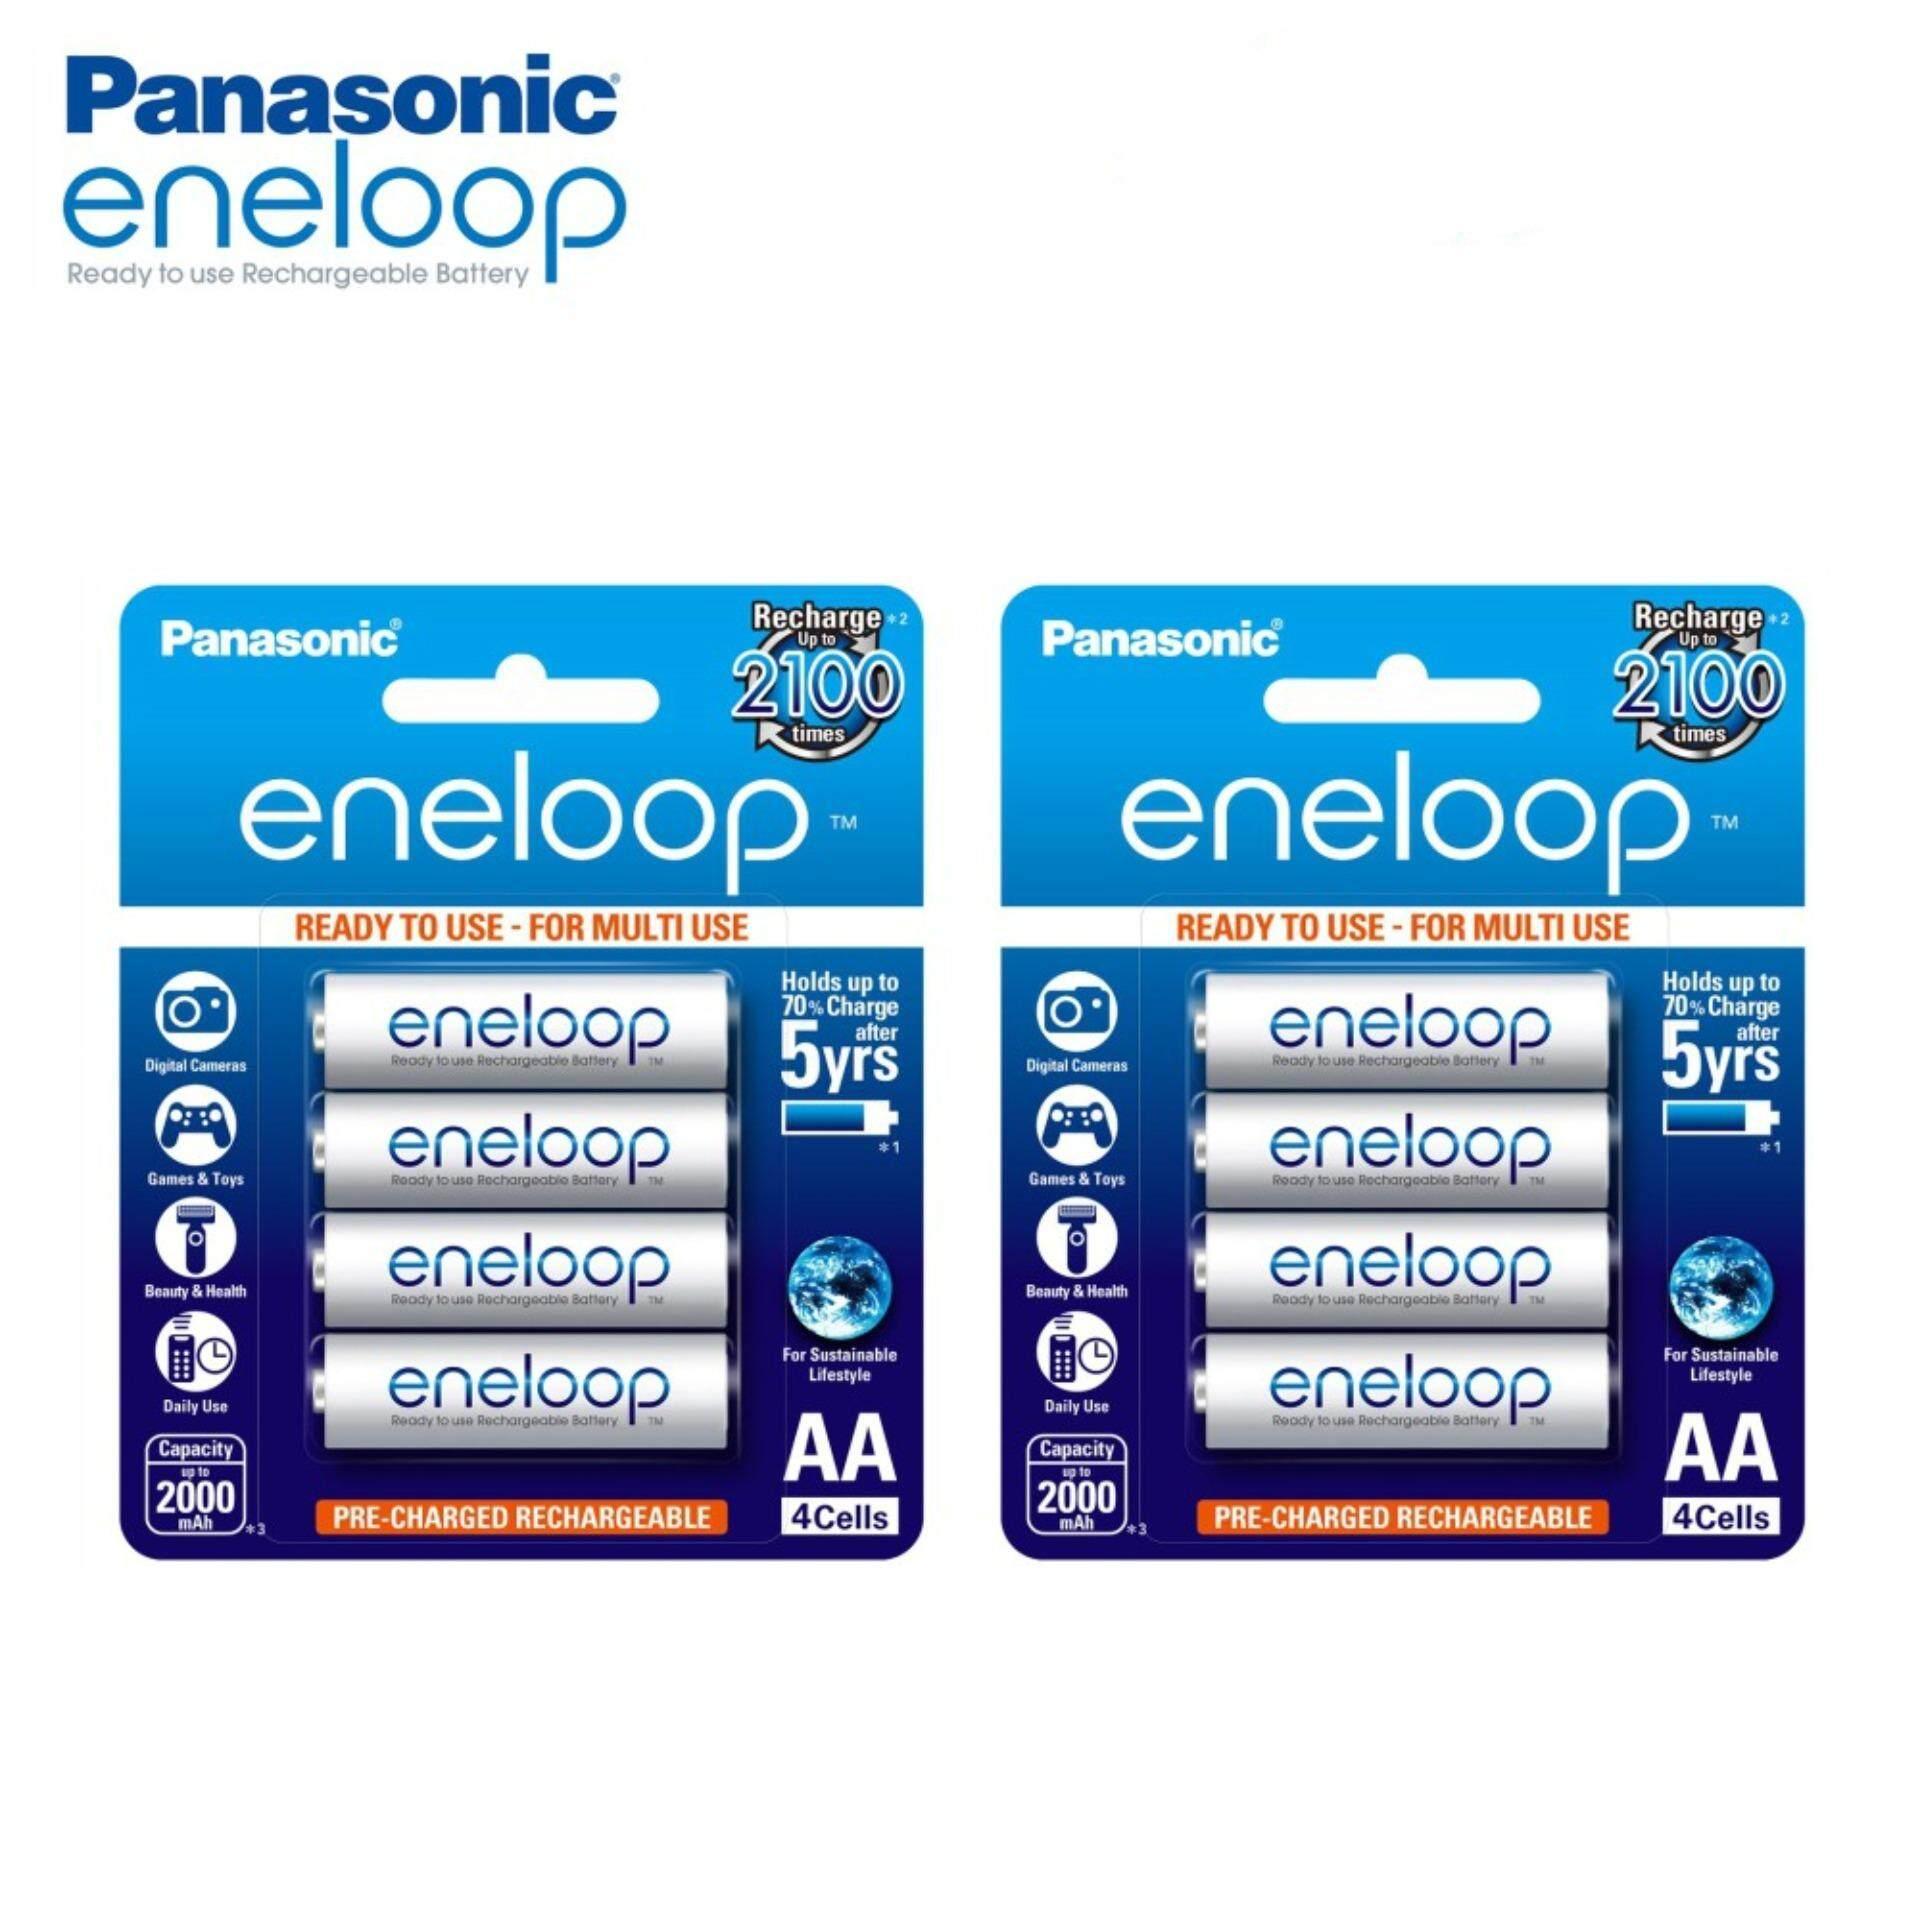 PANASONIC  Eneloop AA Battery Rechargeable 2000mAh (BUNDLE 2 UNITS) ORIGINAL